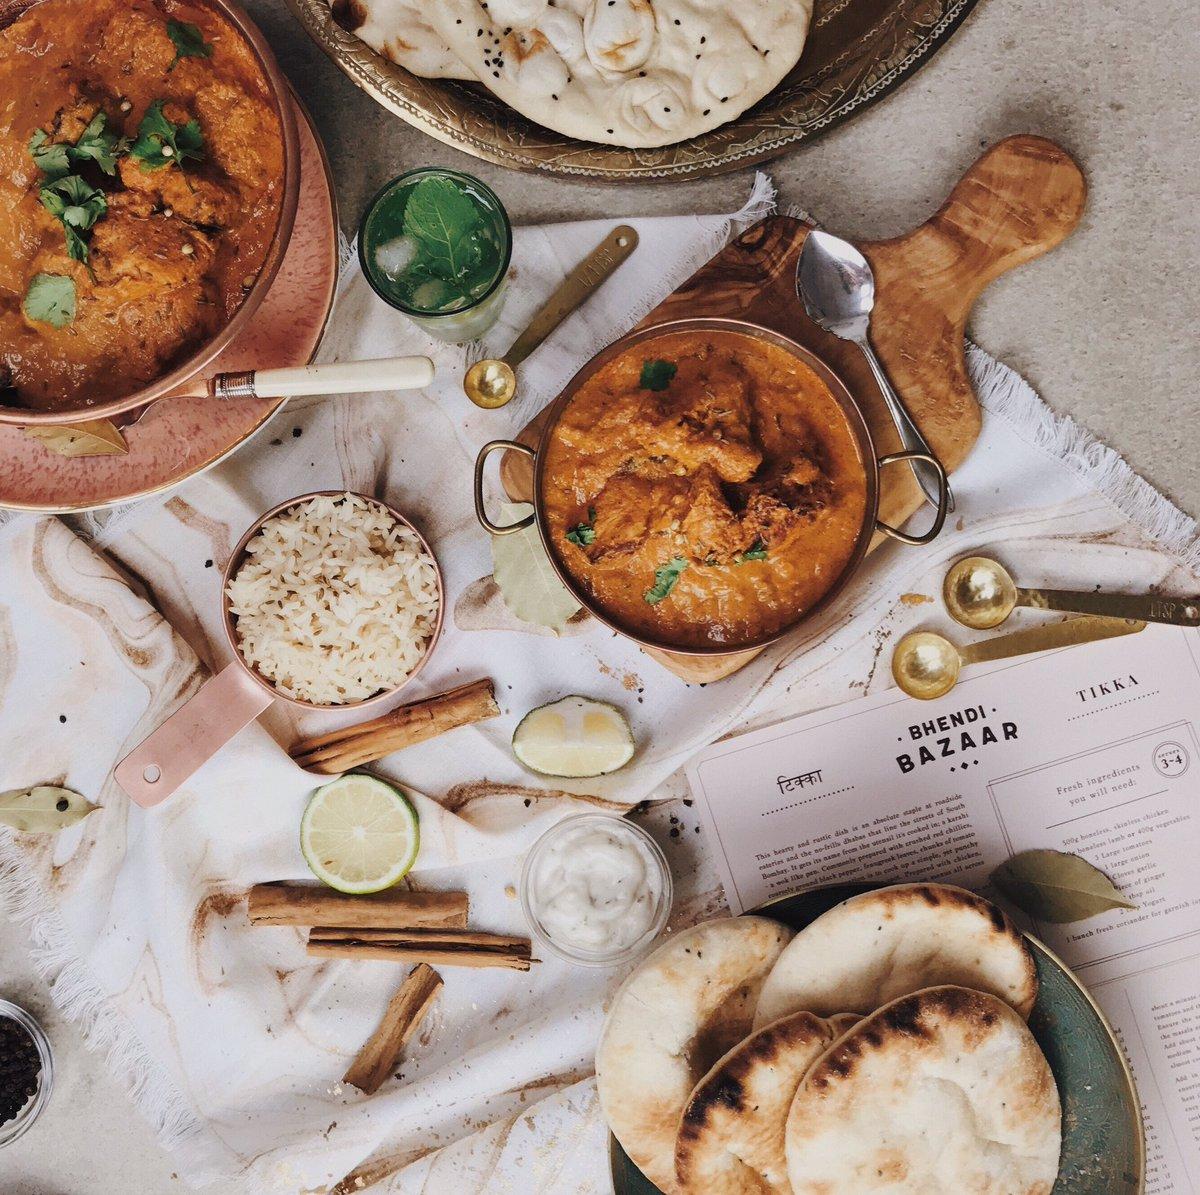 Case Study - Bhendi Bazaar